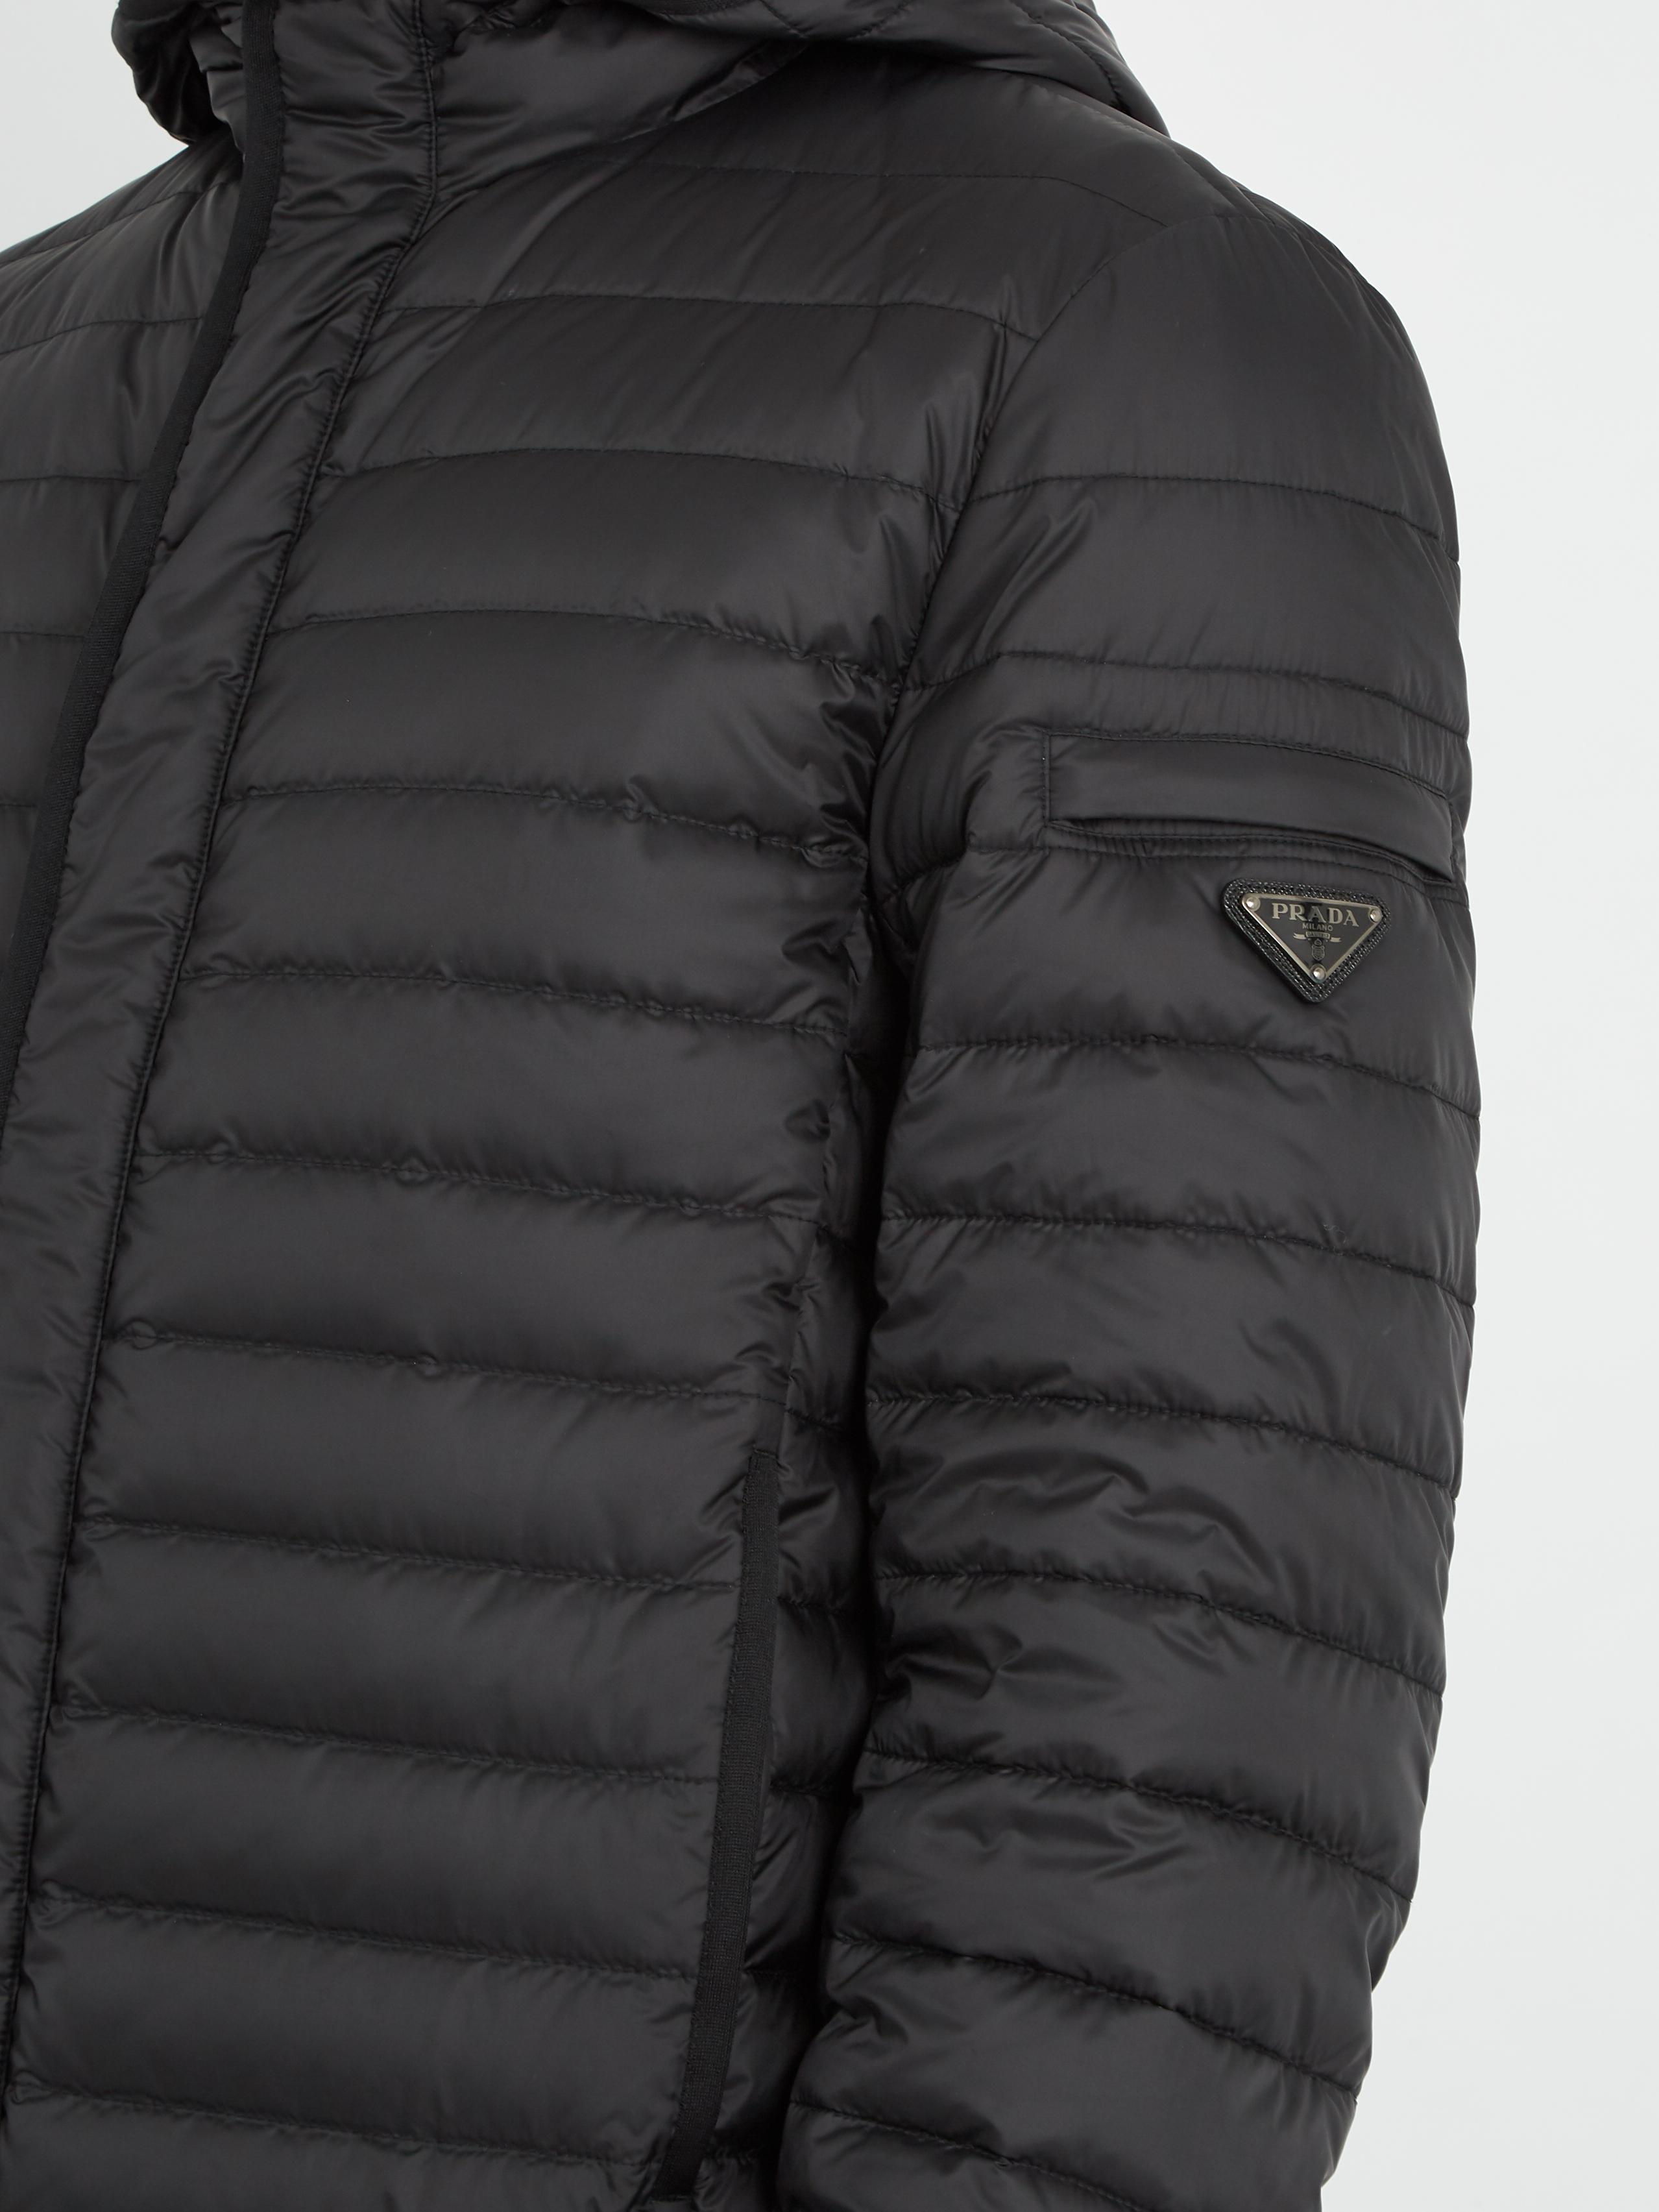 Prada Goose Hooded Down-filled Shell Jacket in Black for Men